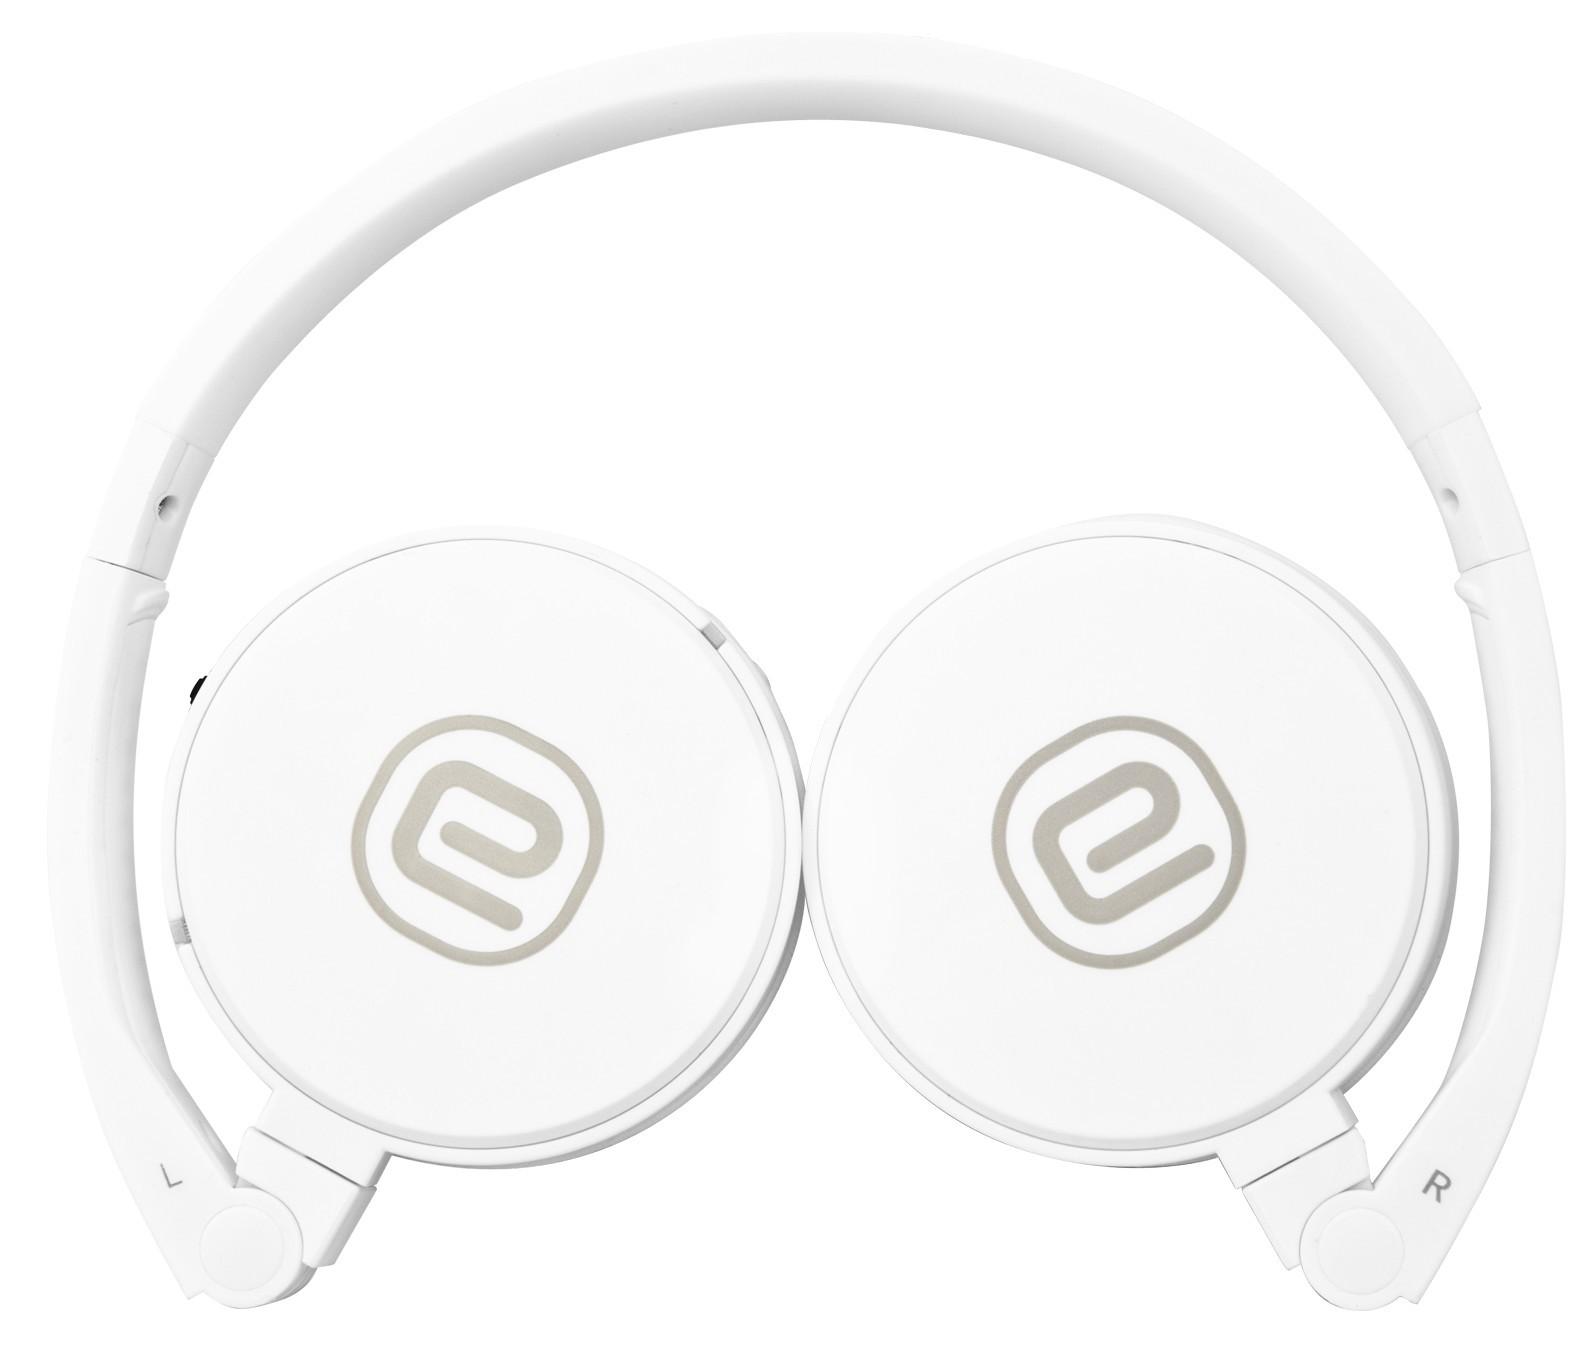 New Antec Headphone Set Has Rotatable Earpads And